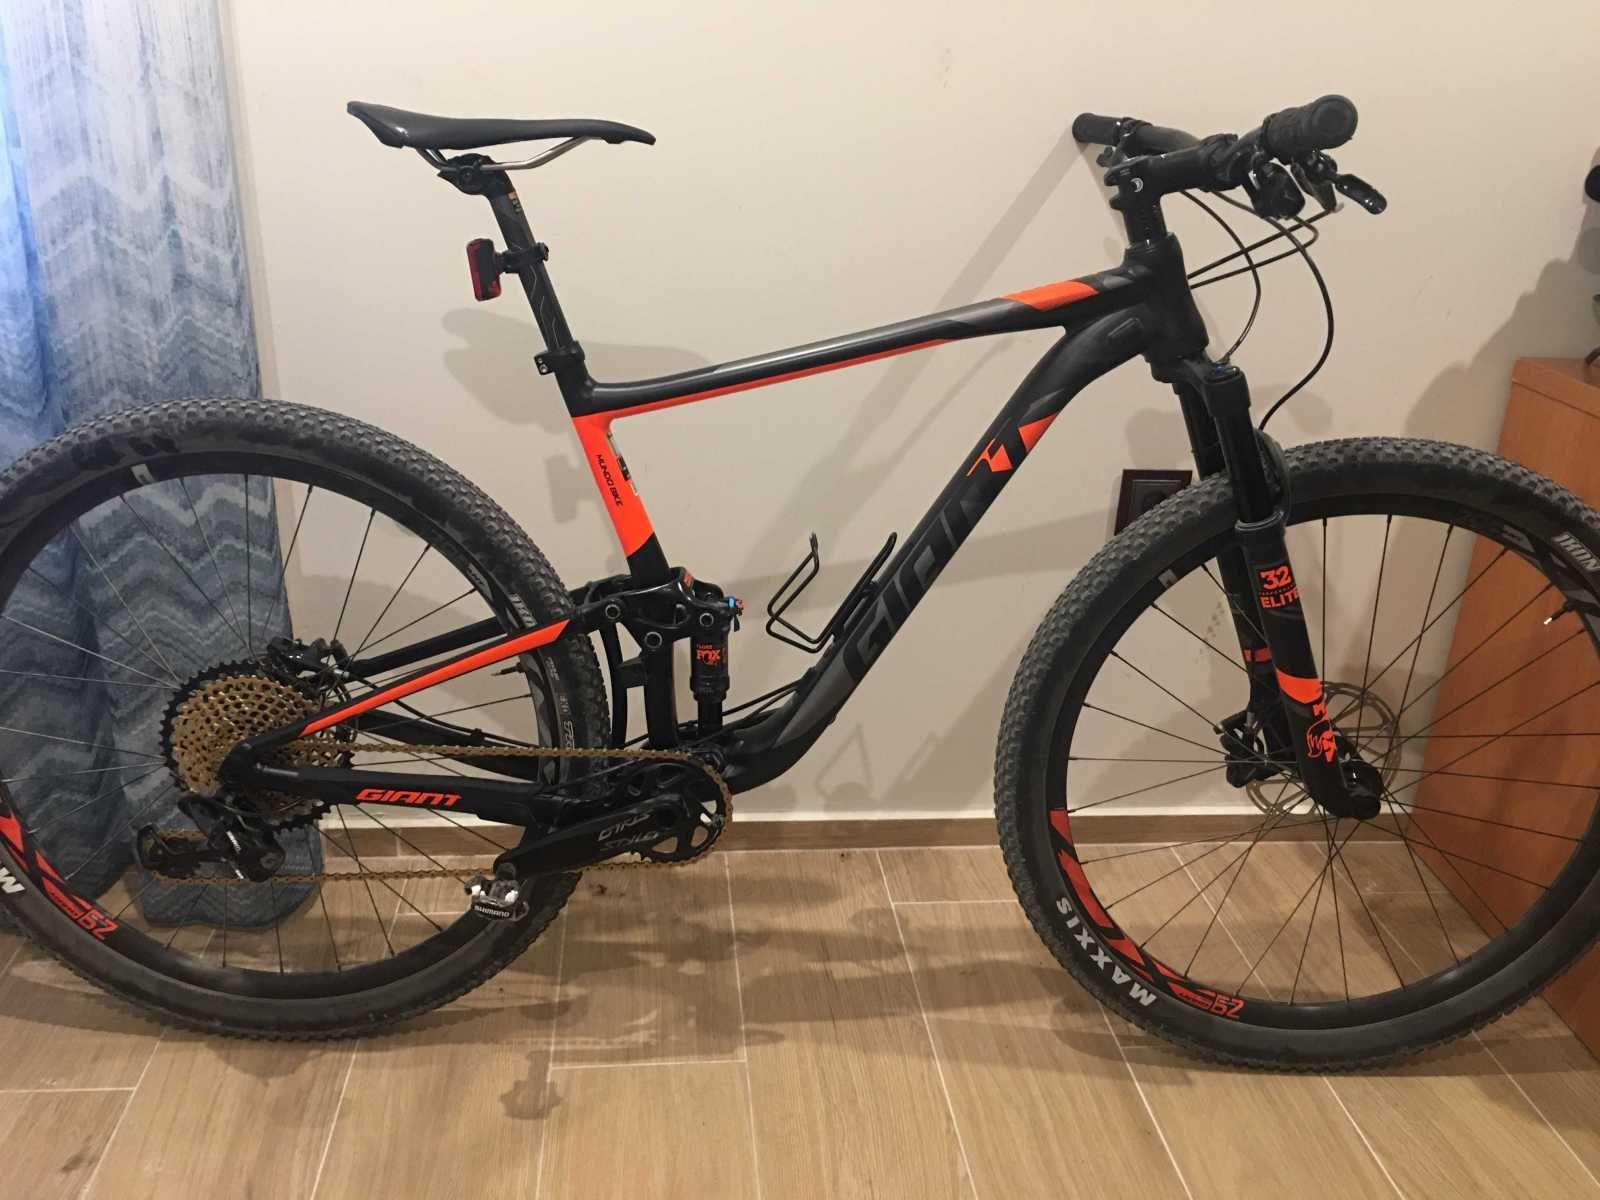 Bicicleta De Montaña Giant Anthem Ref 43927 Talla L Año 2018 Cambio Sram Gx Eagle Cuadro De Aluminio Suspensió Bicicletas Bmx Bicicletas Bicicleta Cross